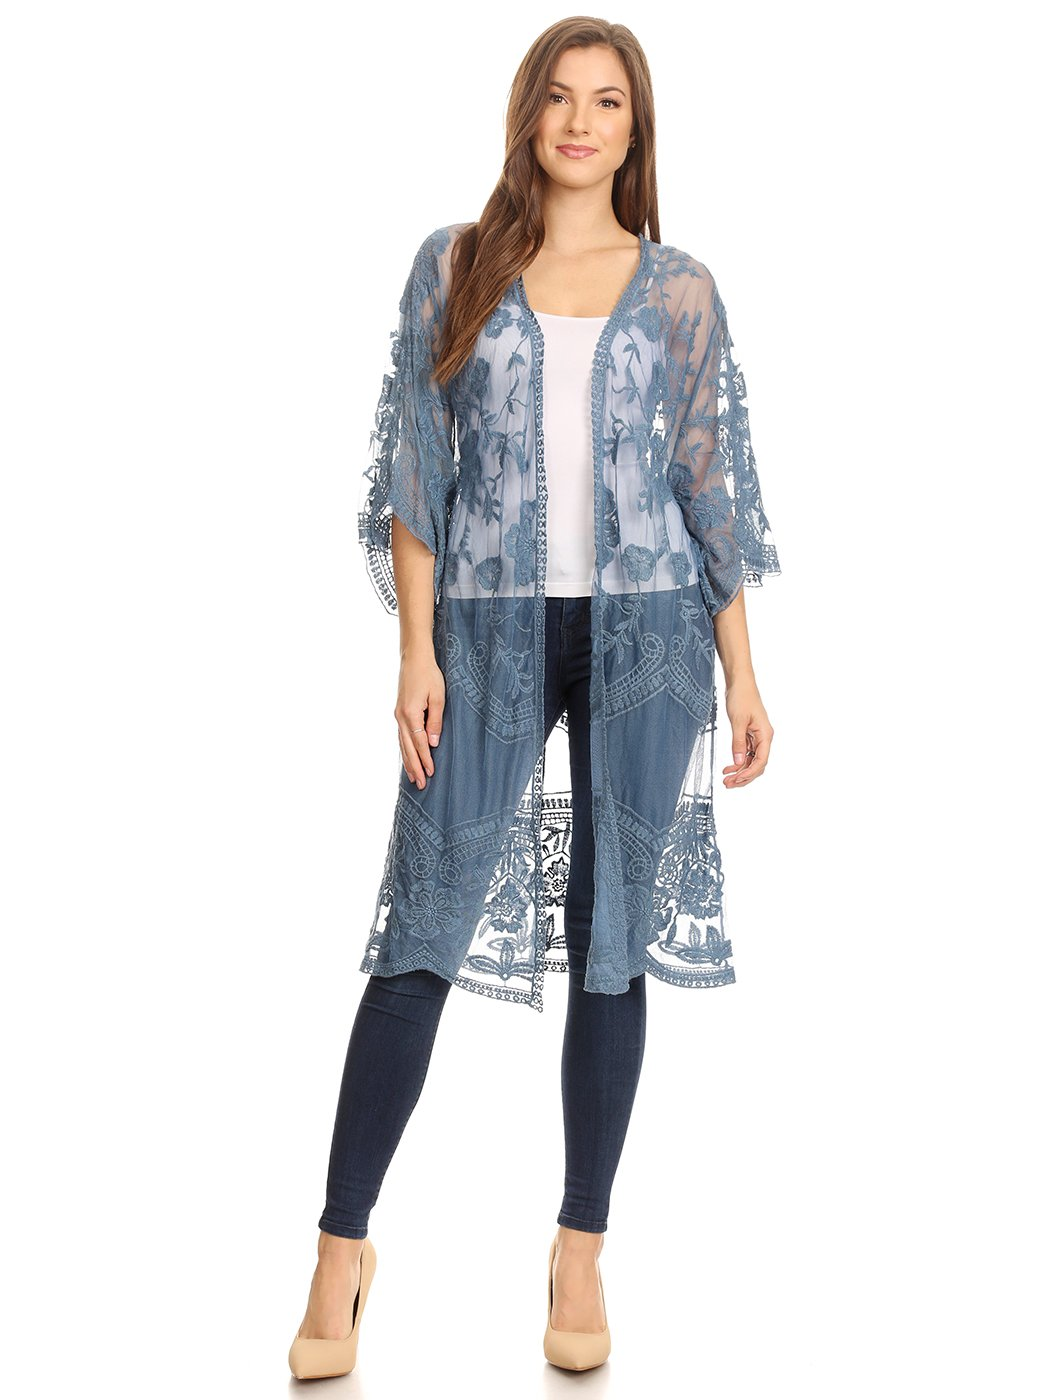 Anna-Kaci Womens Long Embroidered Lace Kimono Cardigan with Half Sleeves, Blue, OneSize by Anna-Kaci (Image #1)